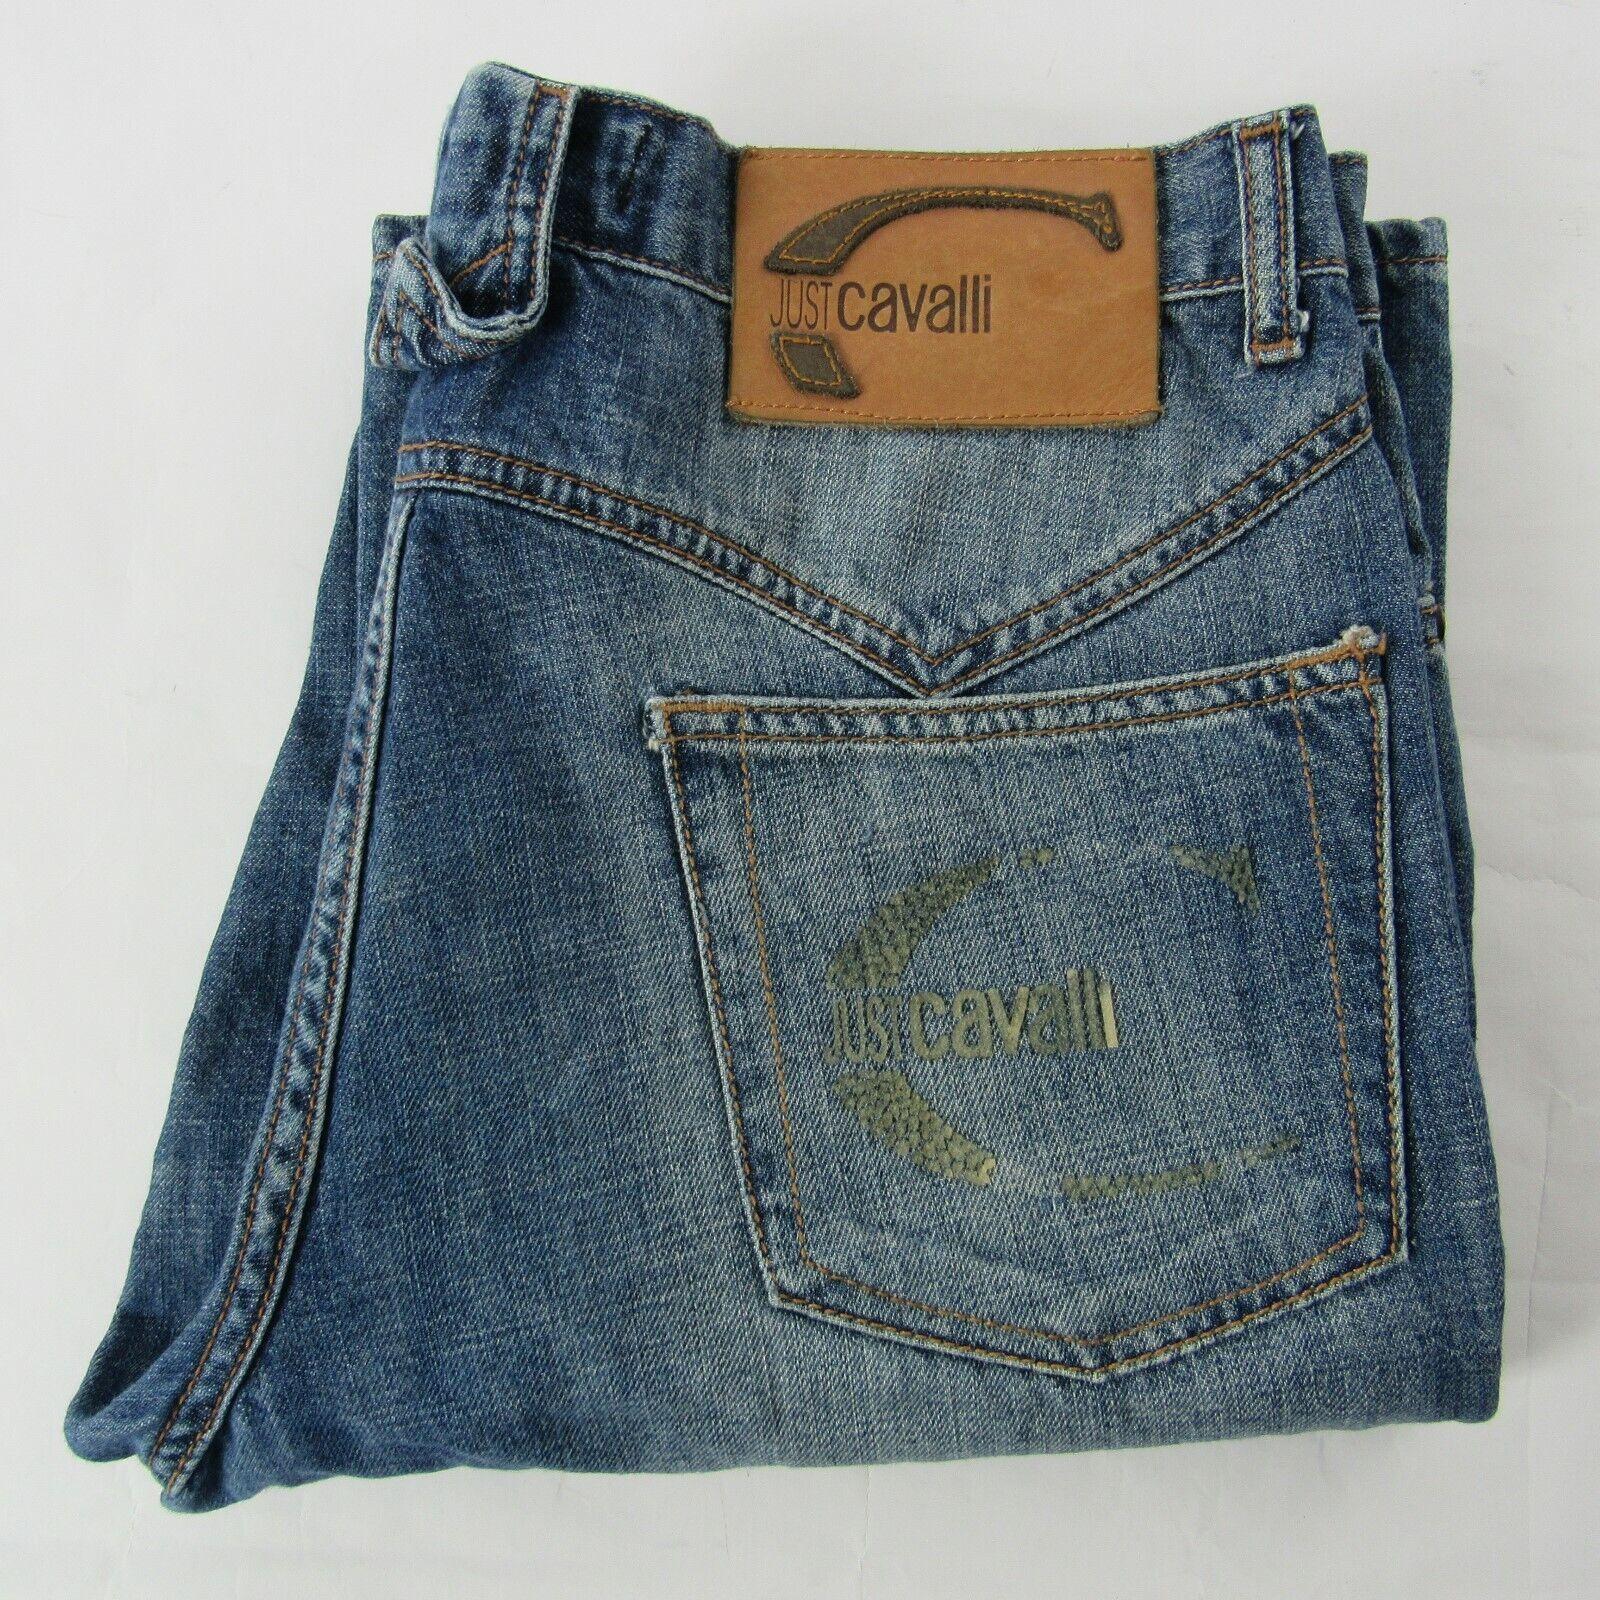 Just Cavalli Jeans 32 x 34 Straight Leg Button Fly bluee Vintage Wash Denim